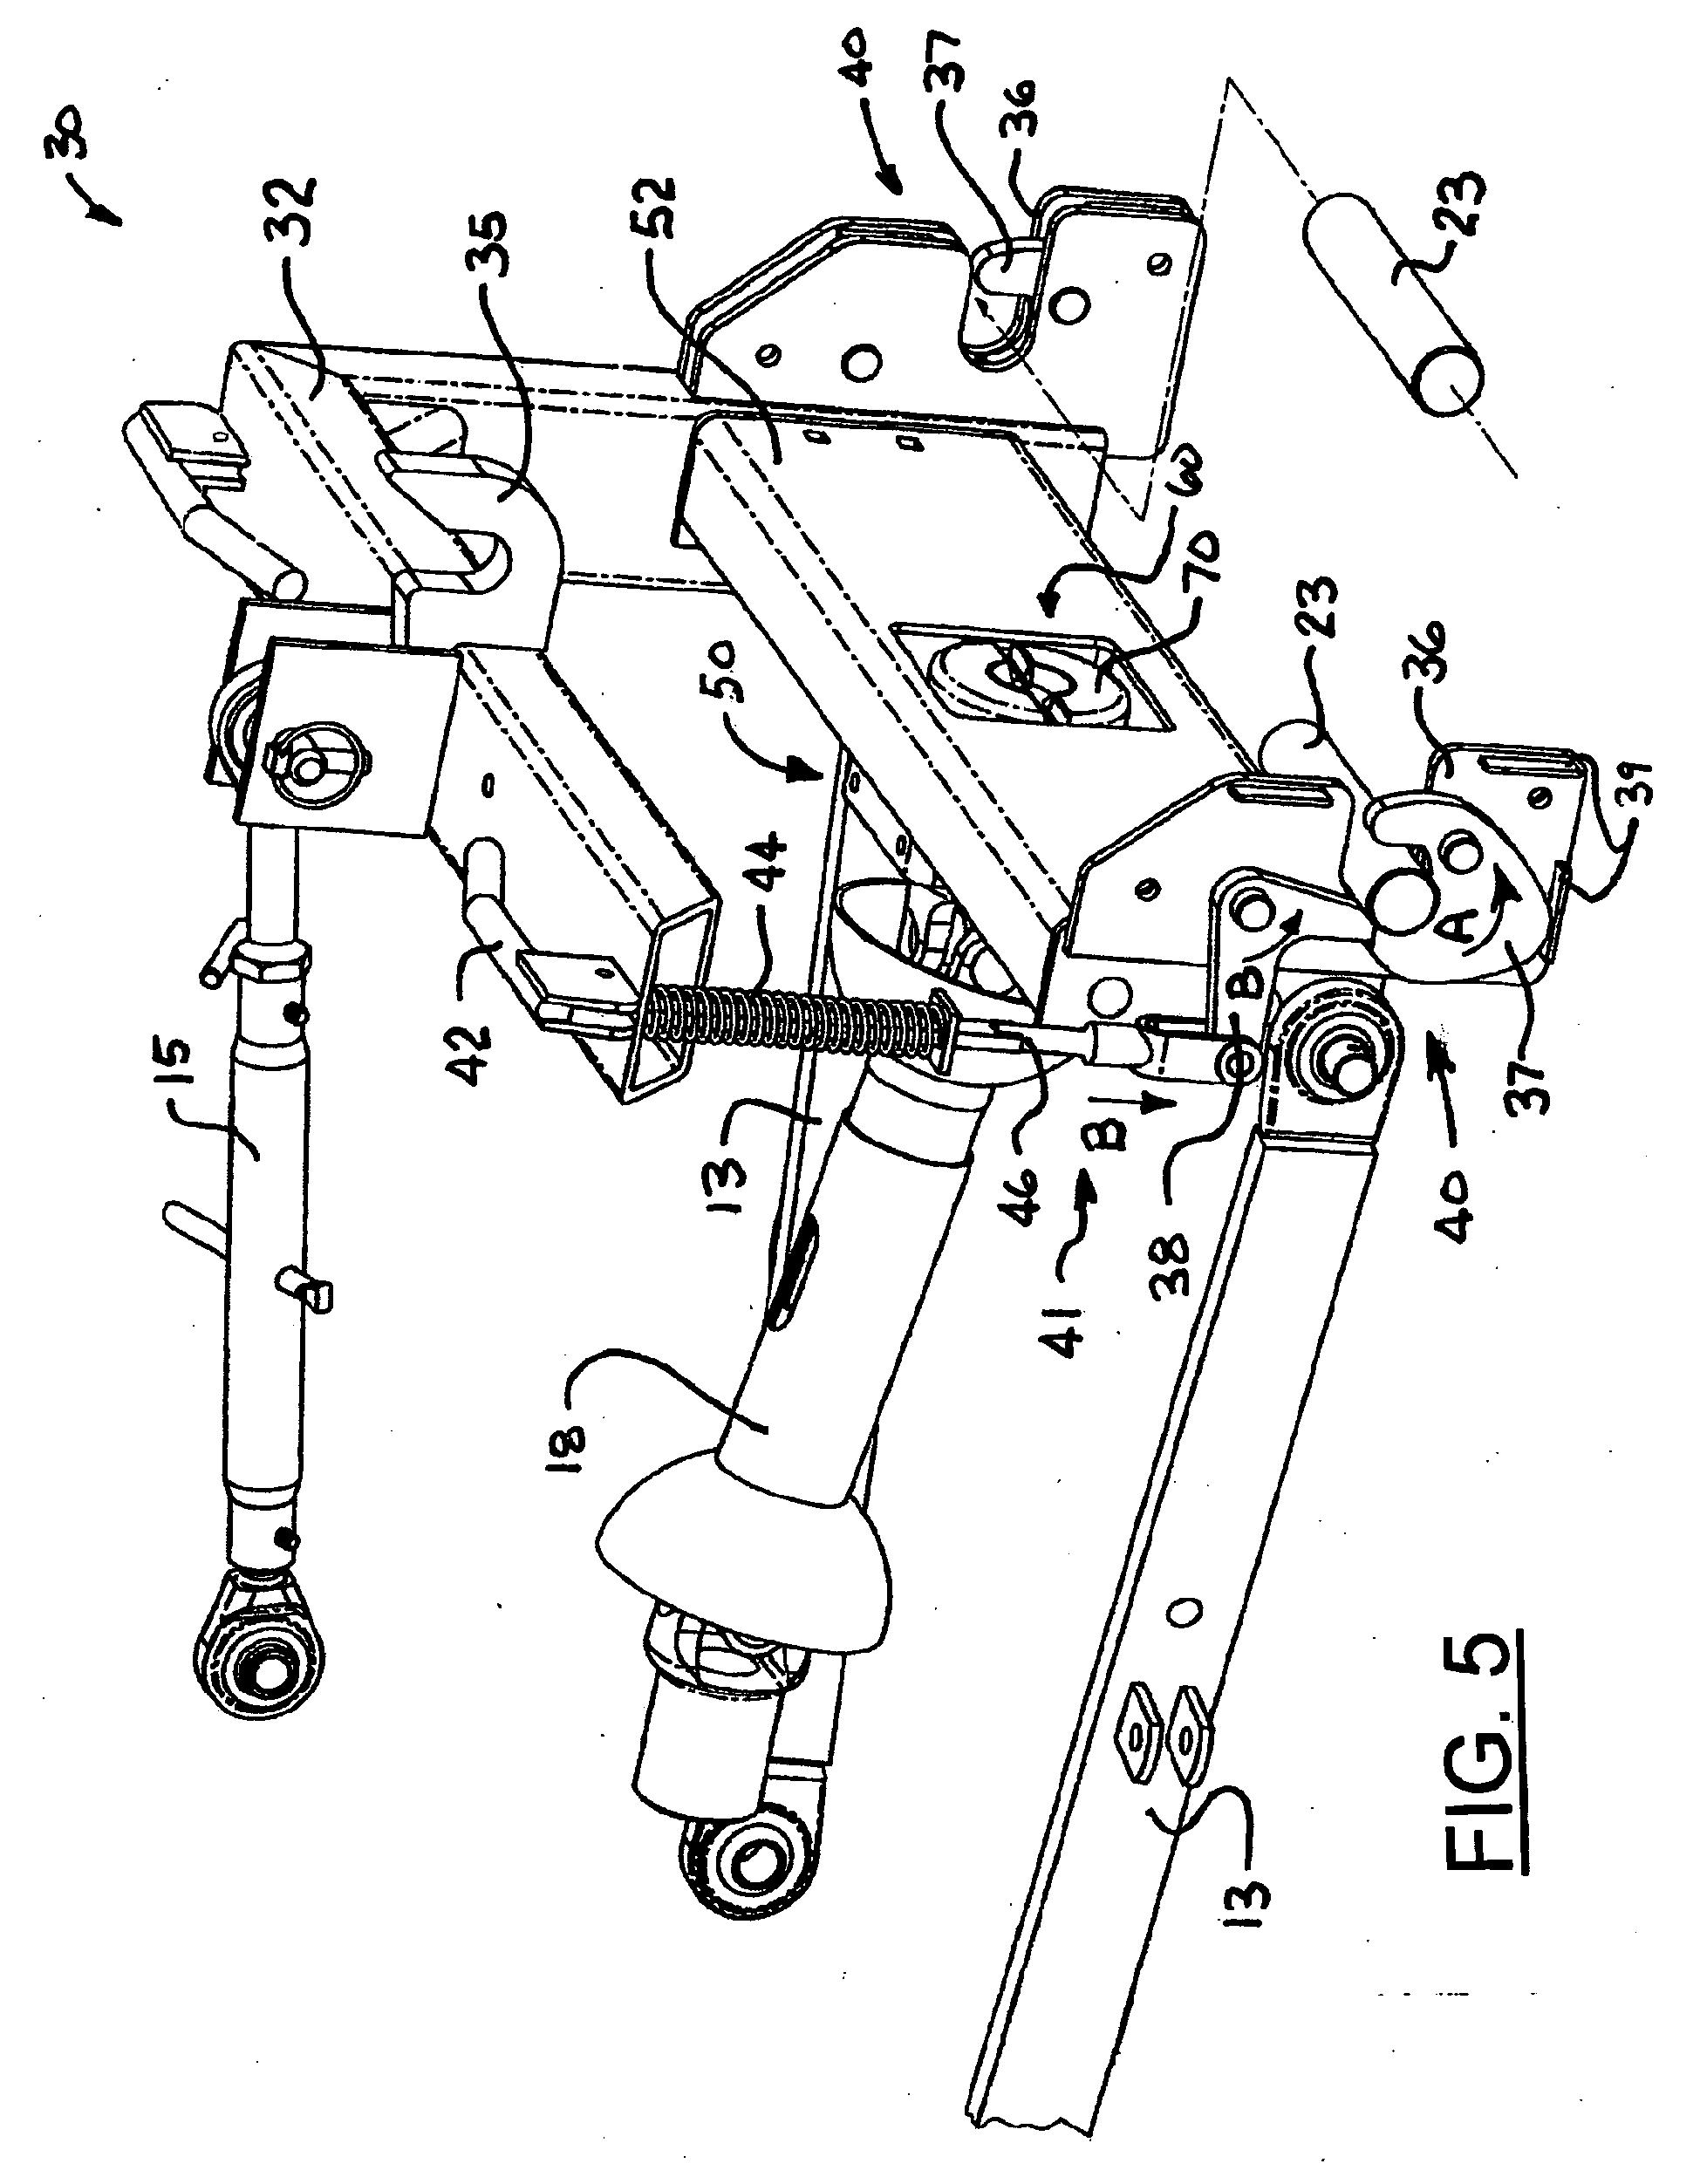 patent ep1932411b1